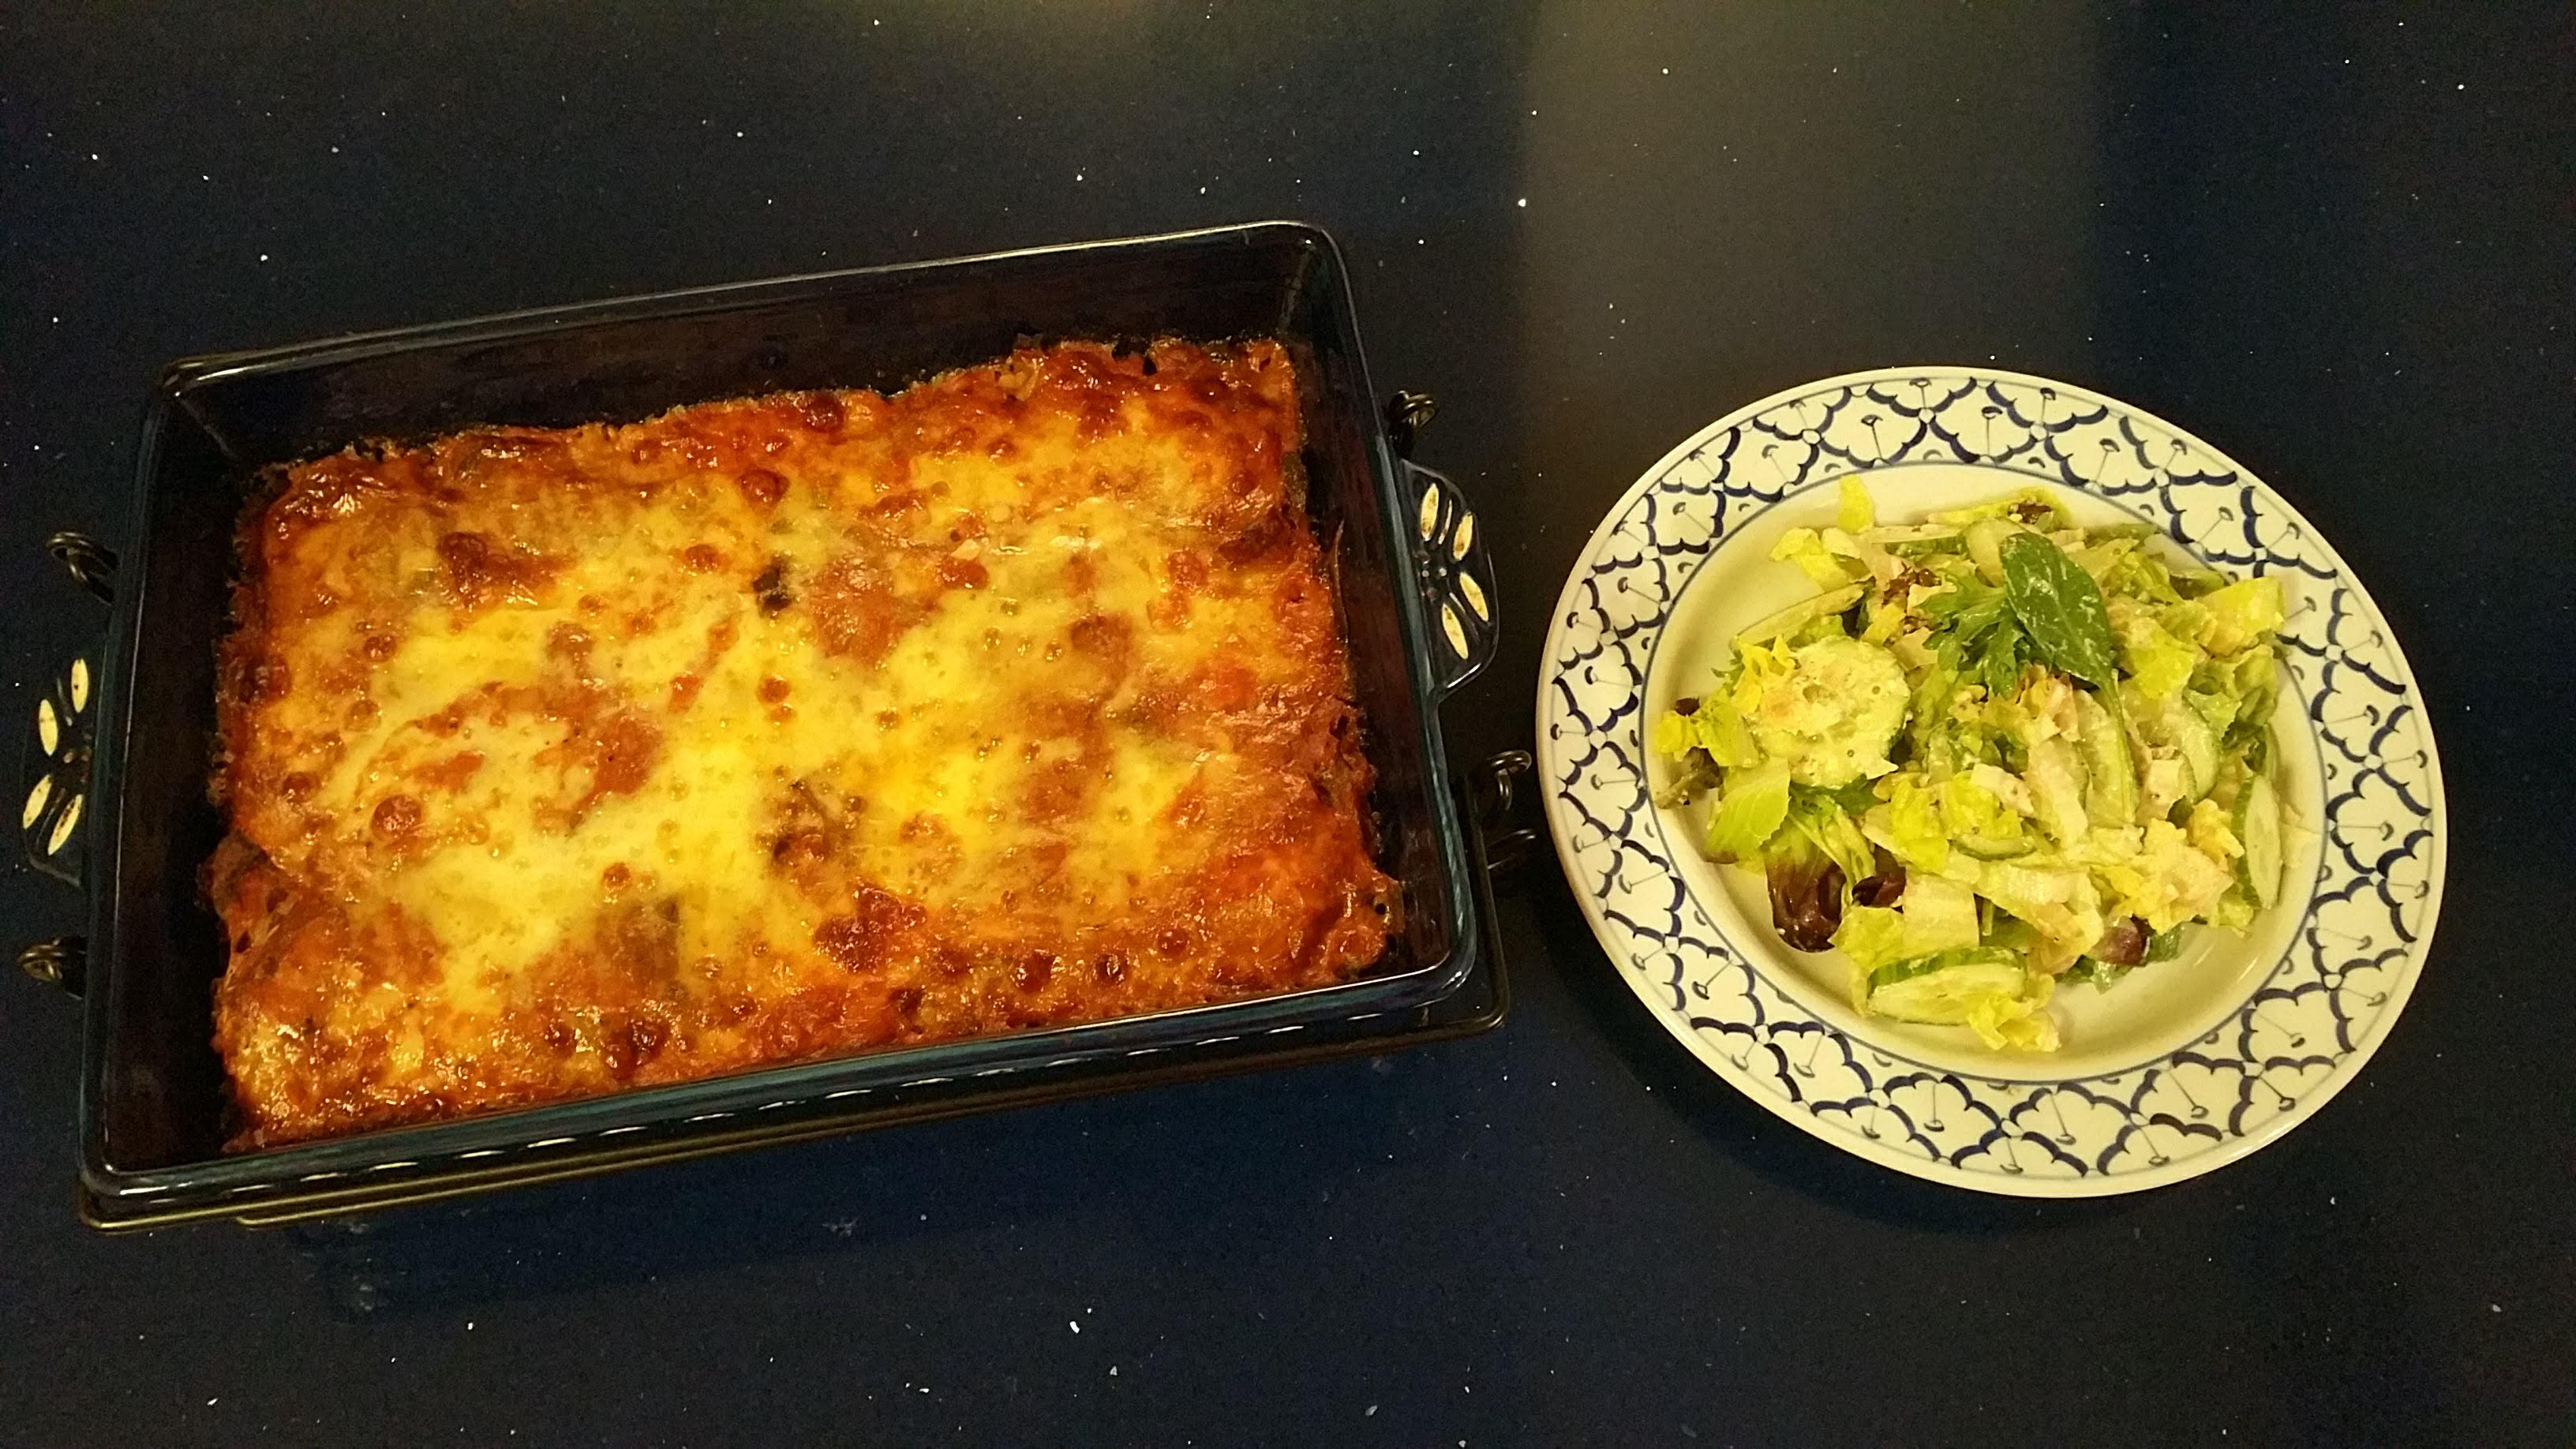 Spaghetti Squash Faux Lasagna with Salad